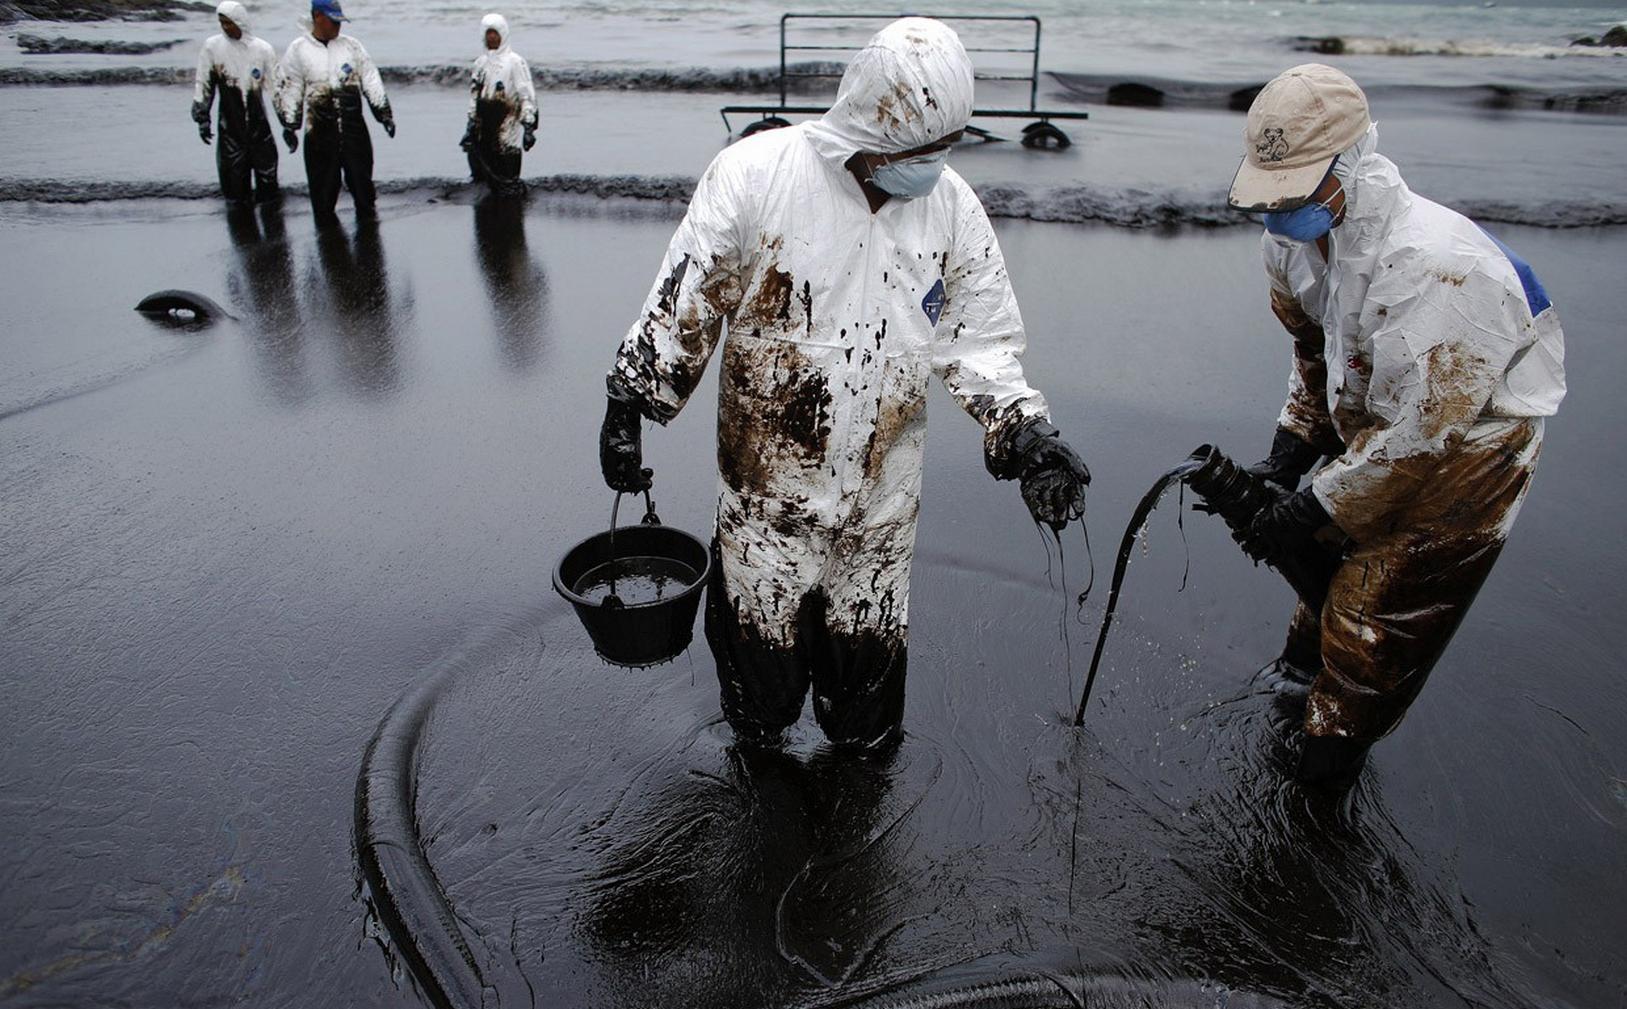 работа по утилизации нефтешламов